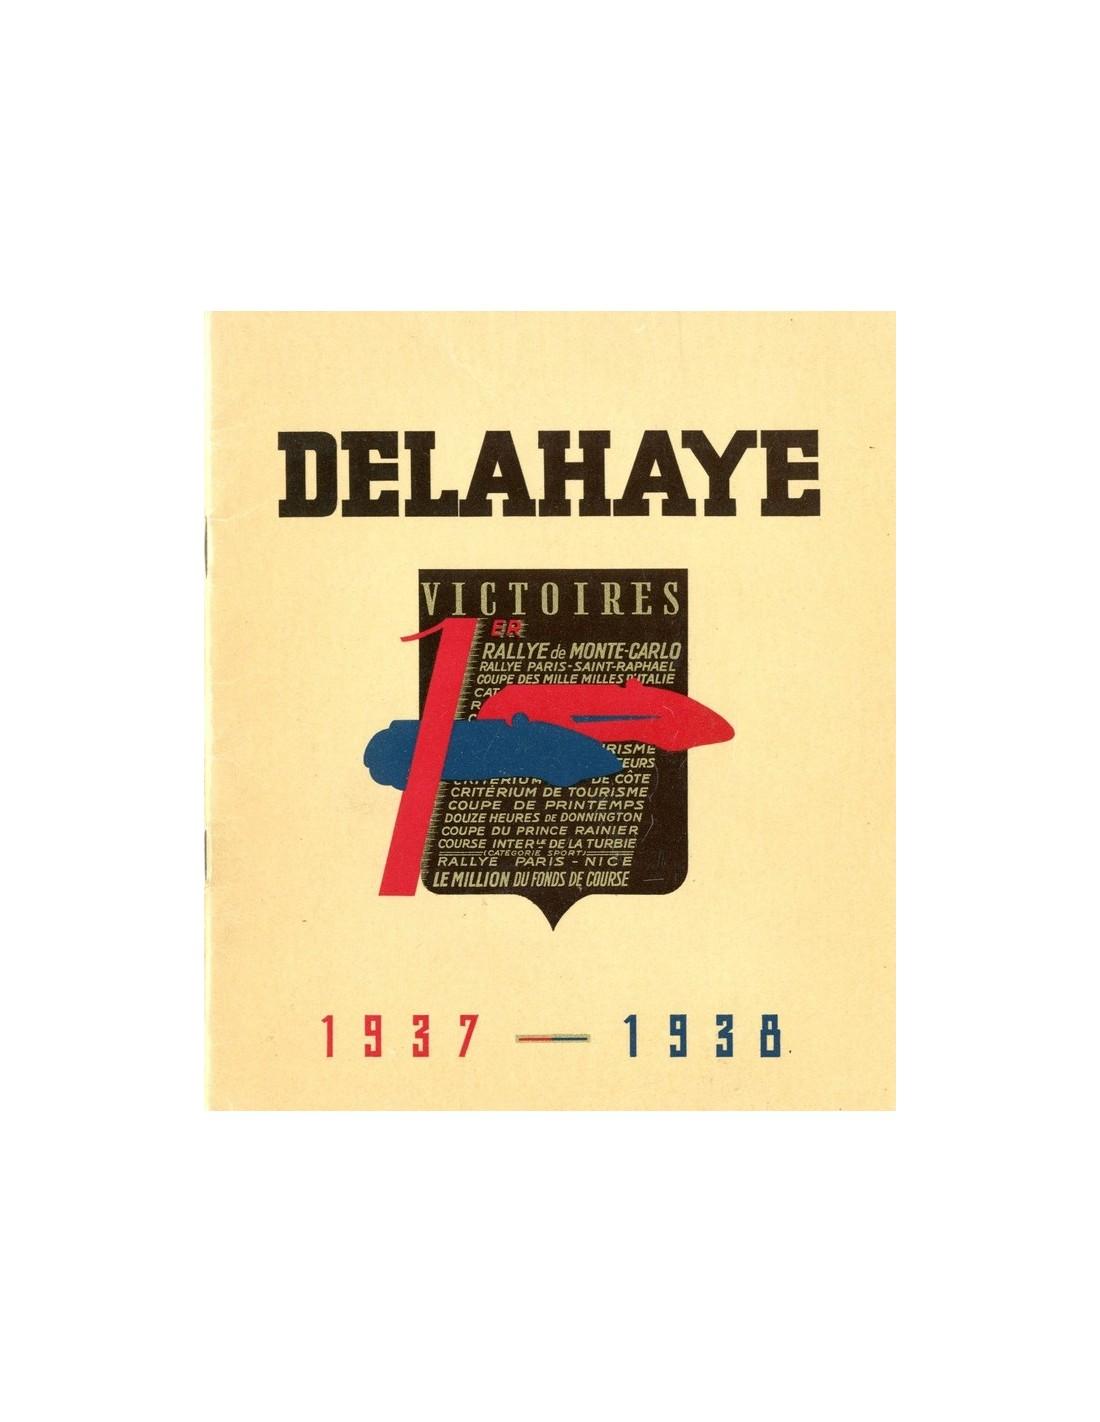 1937 1938 Delahaye Range Brochure French